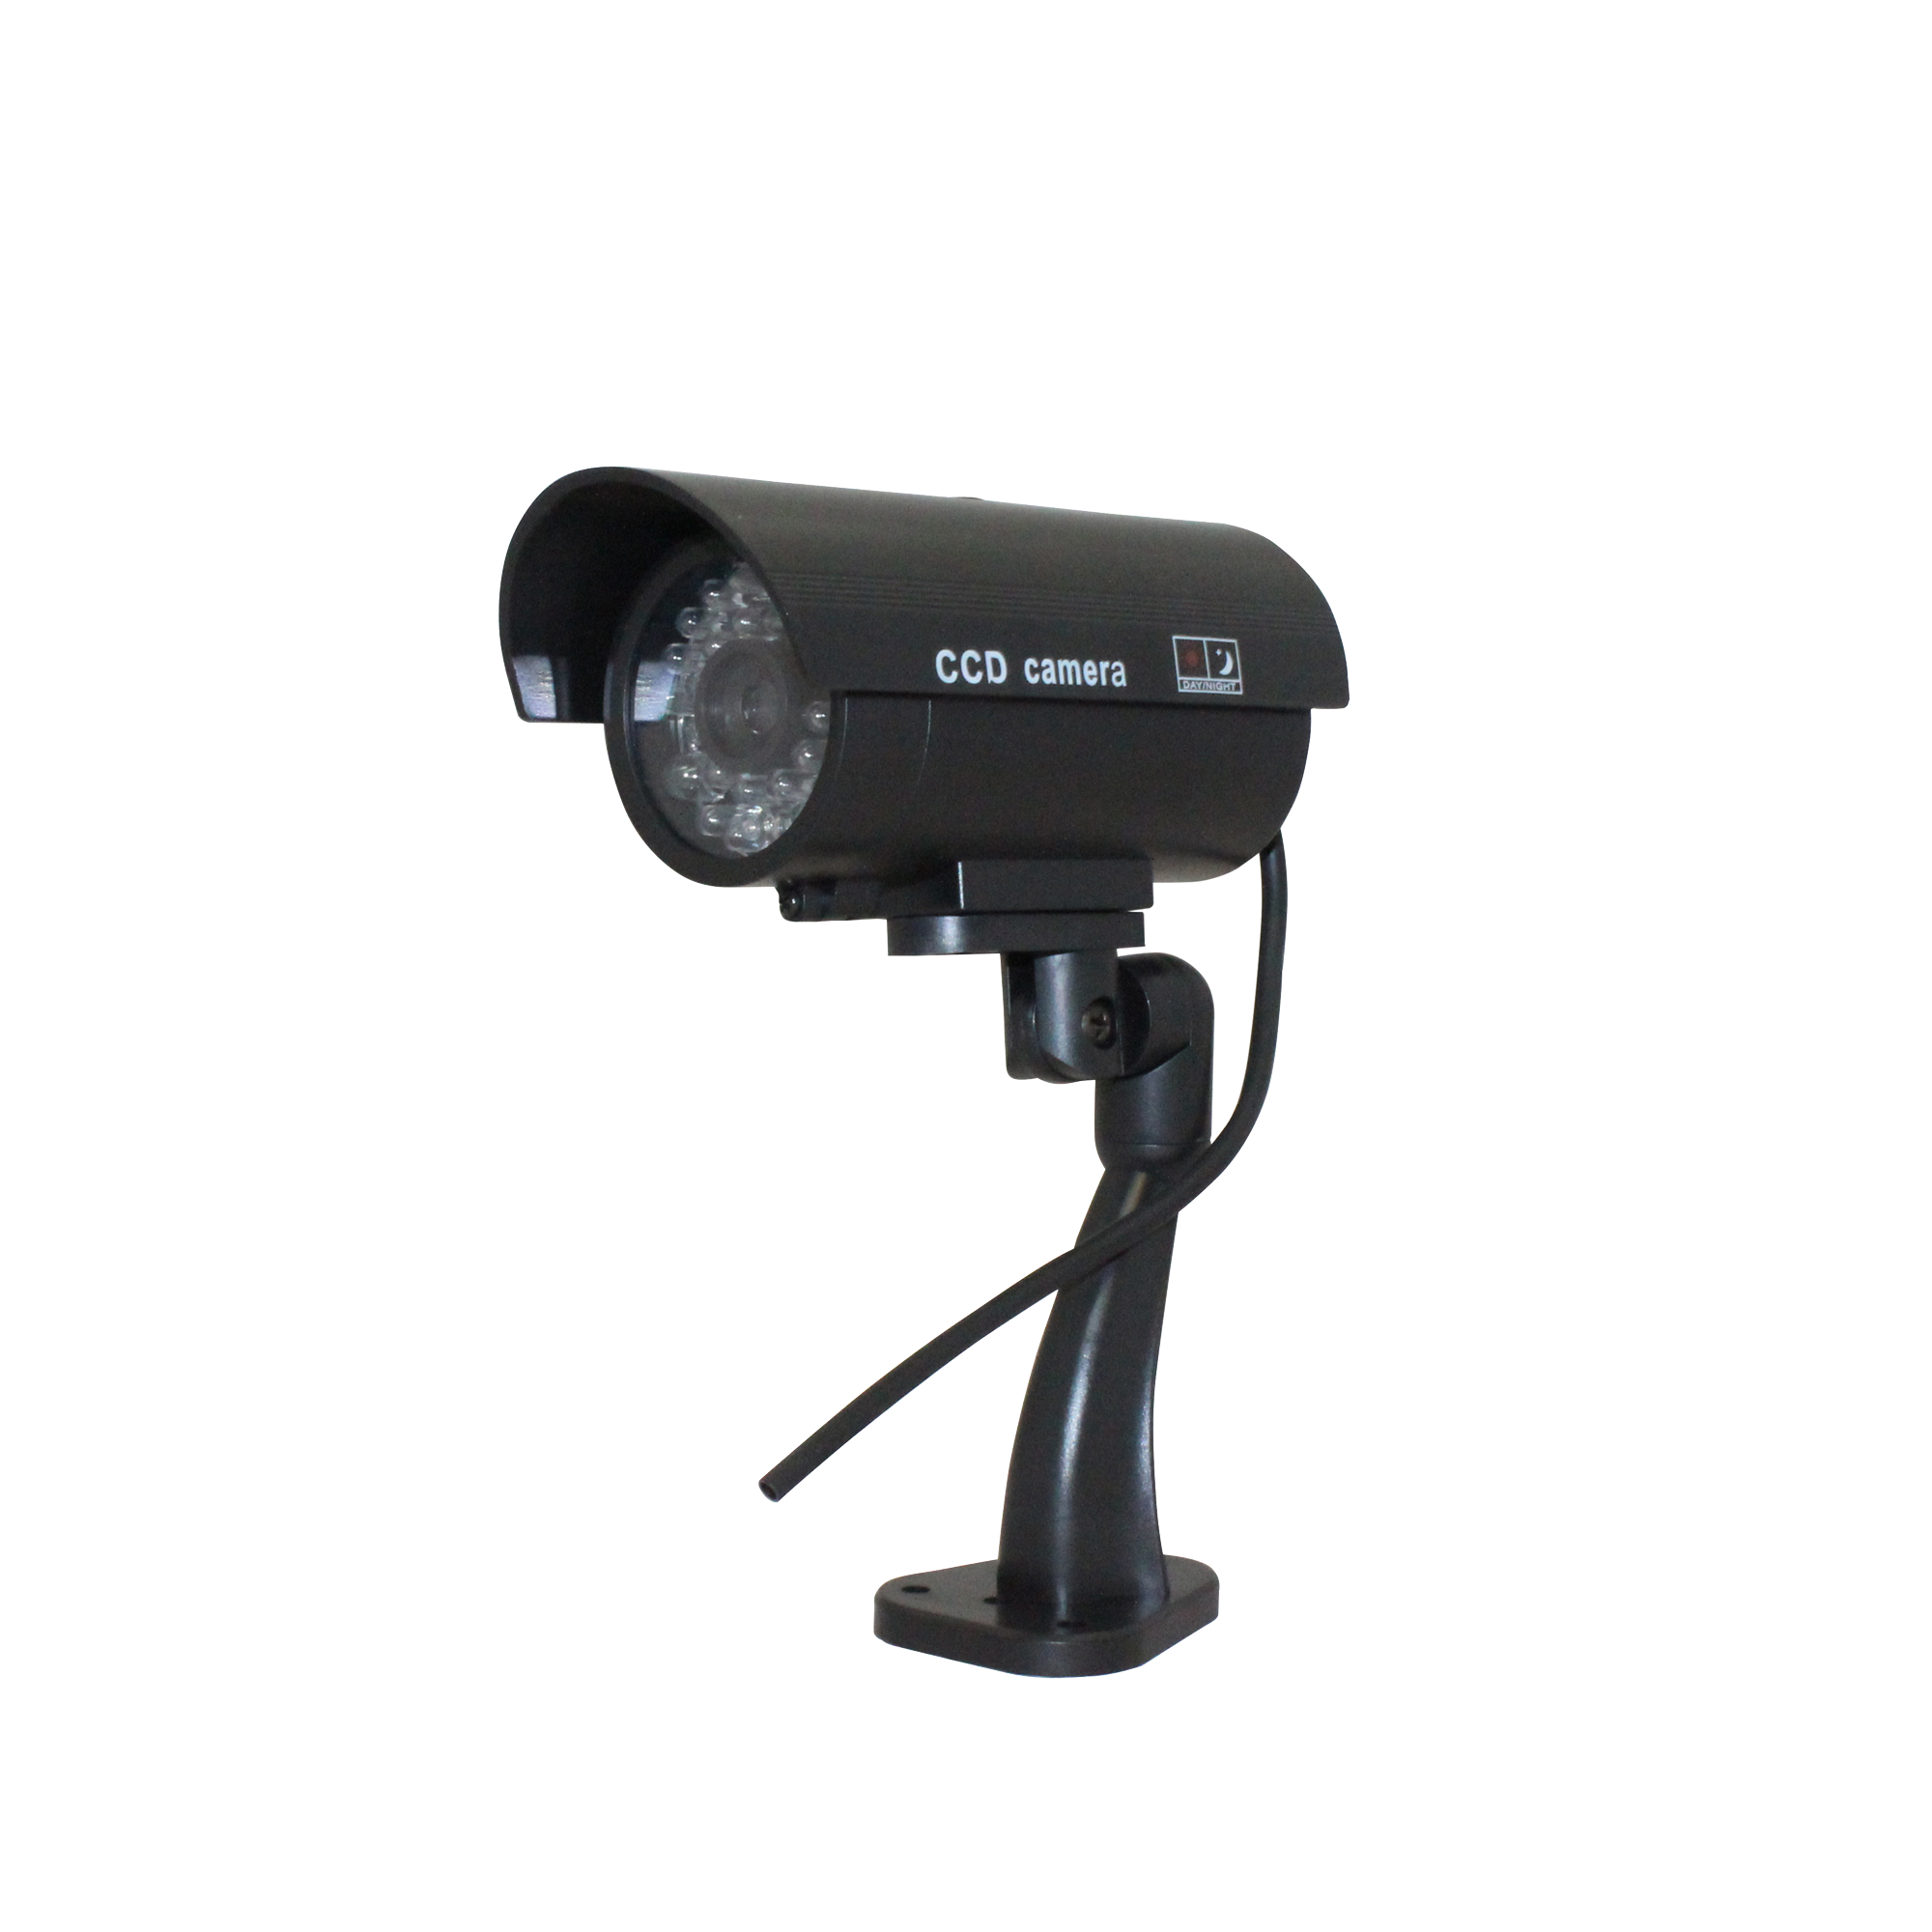 Муляж камеры видеонаблюдения SpeedRoll 2600B